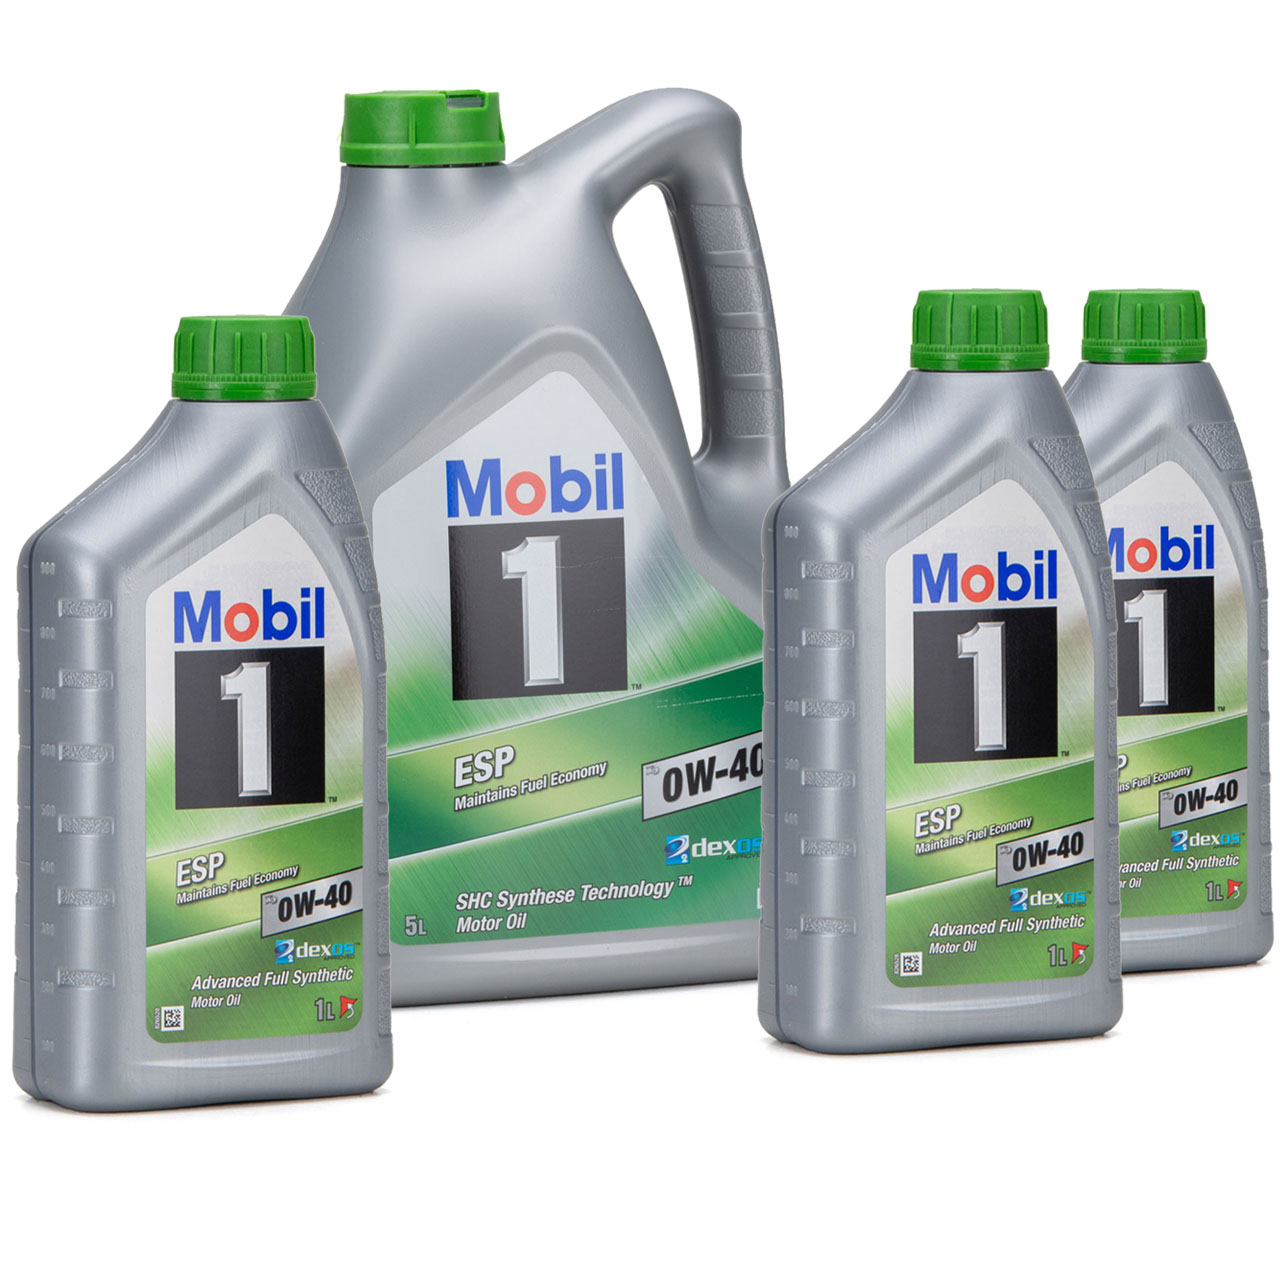 Mobil 1 ESP X3 C40 Motoröl Öl 0W-40 0W40 dexos2 PORSCHE C40 VW 511.00 - 8 Liter